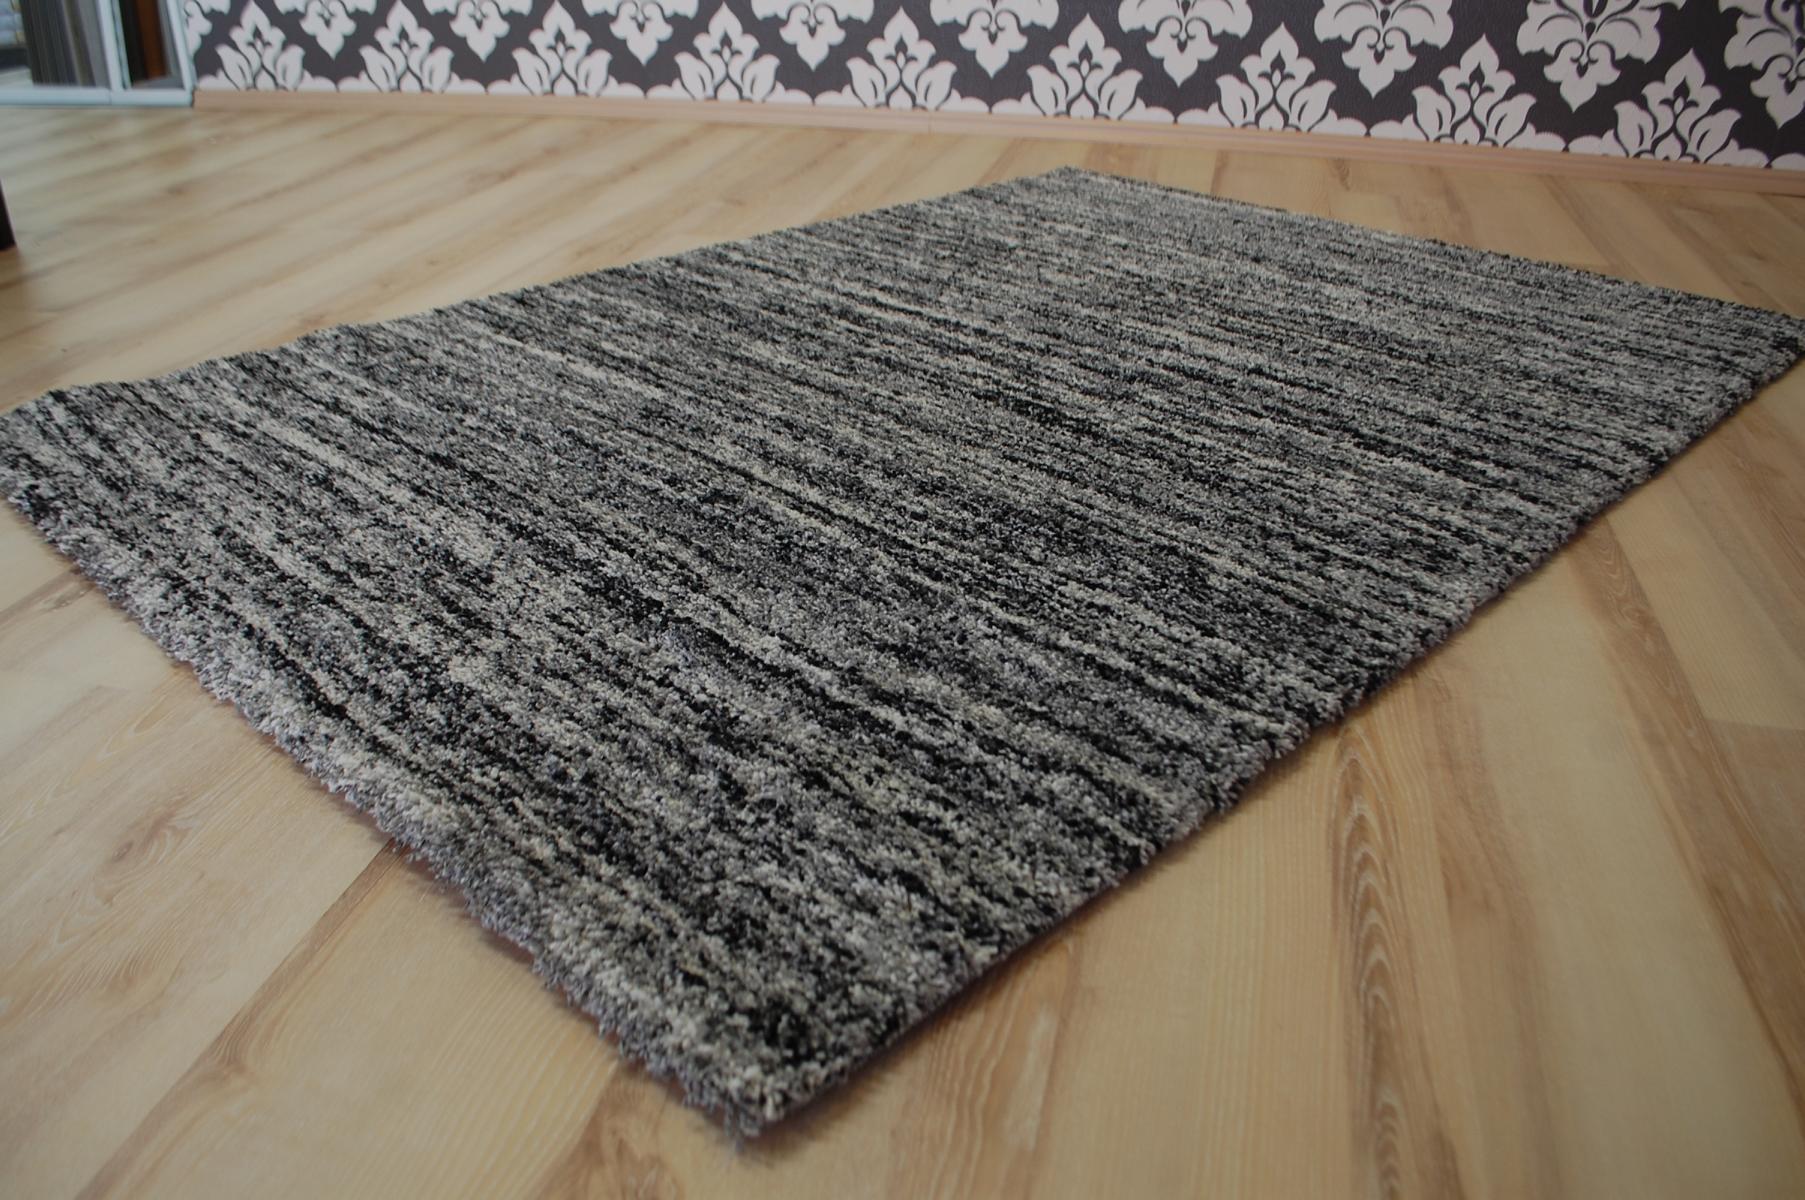 teppich mehari ragolle 23067 4258 grau schwarz 240x340 cm ebay. Black Bedroom Furniture Sets. Home Design Ideas